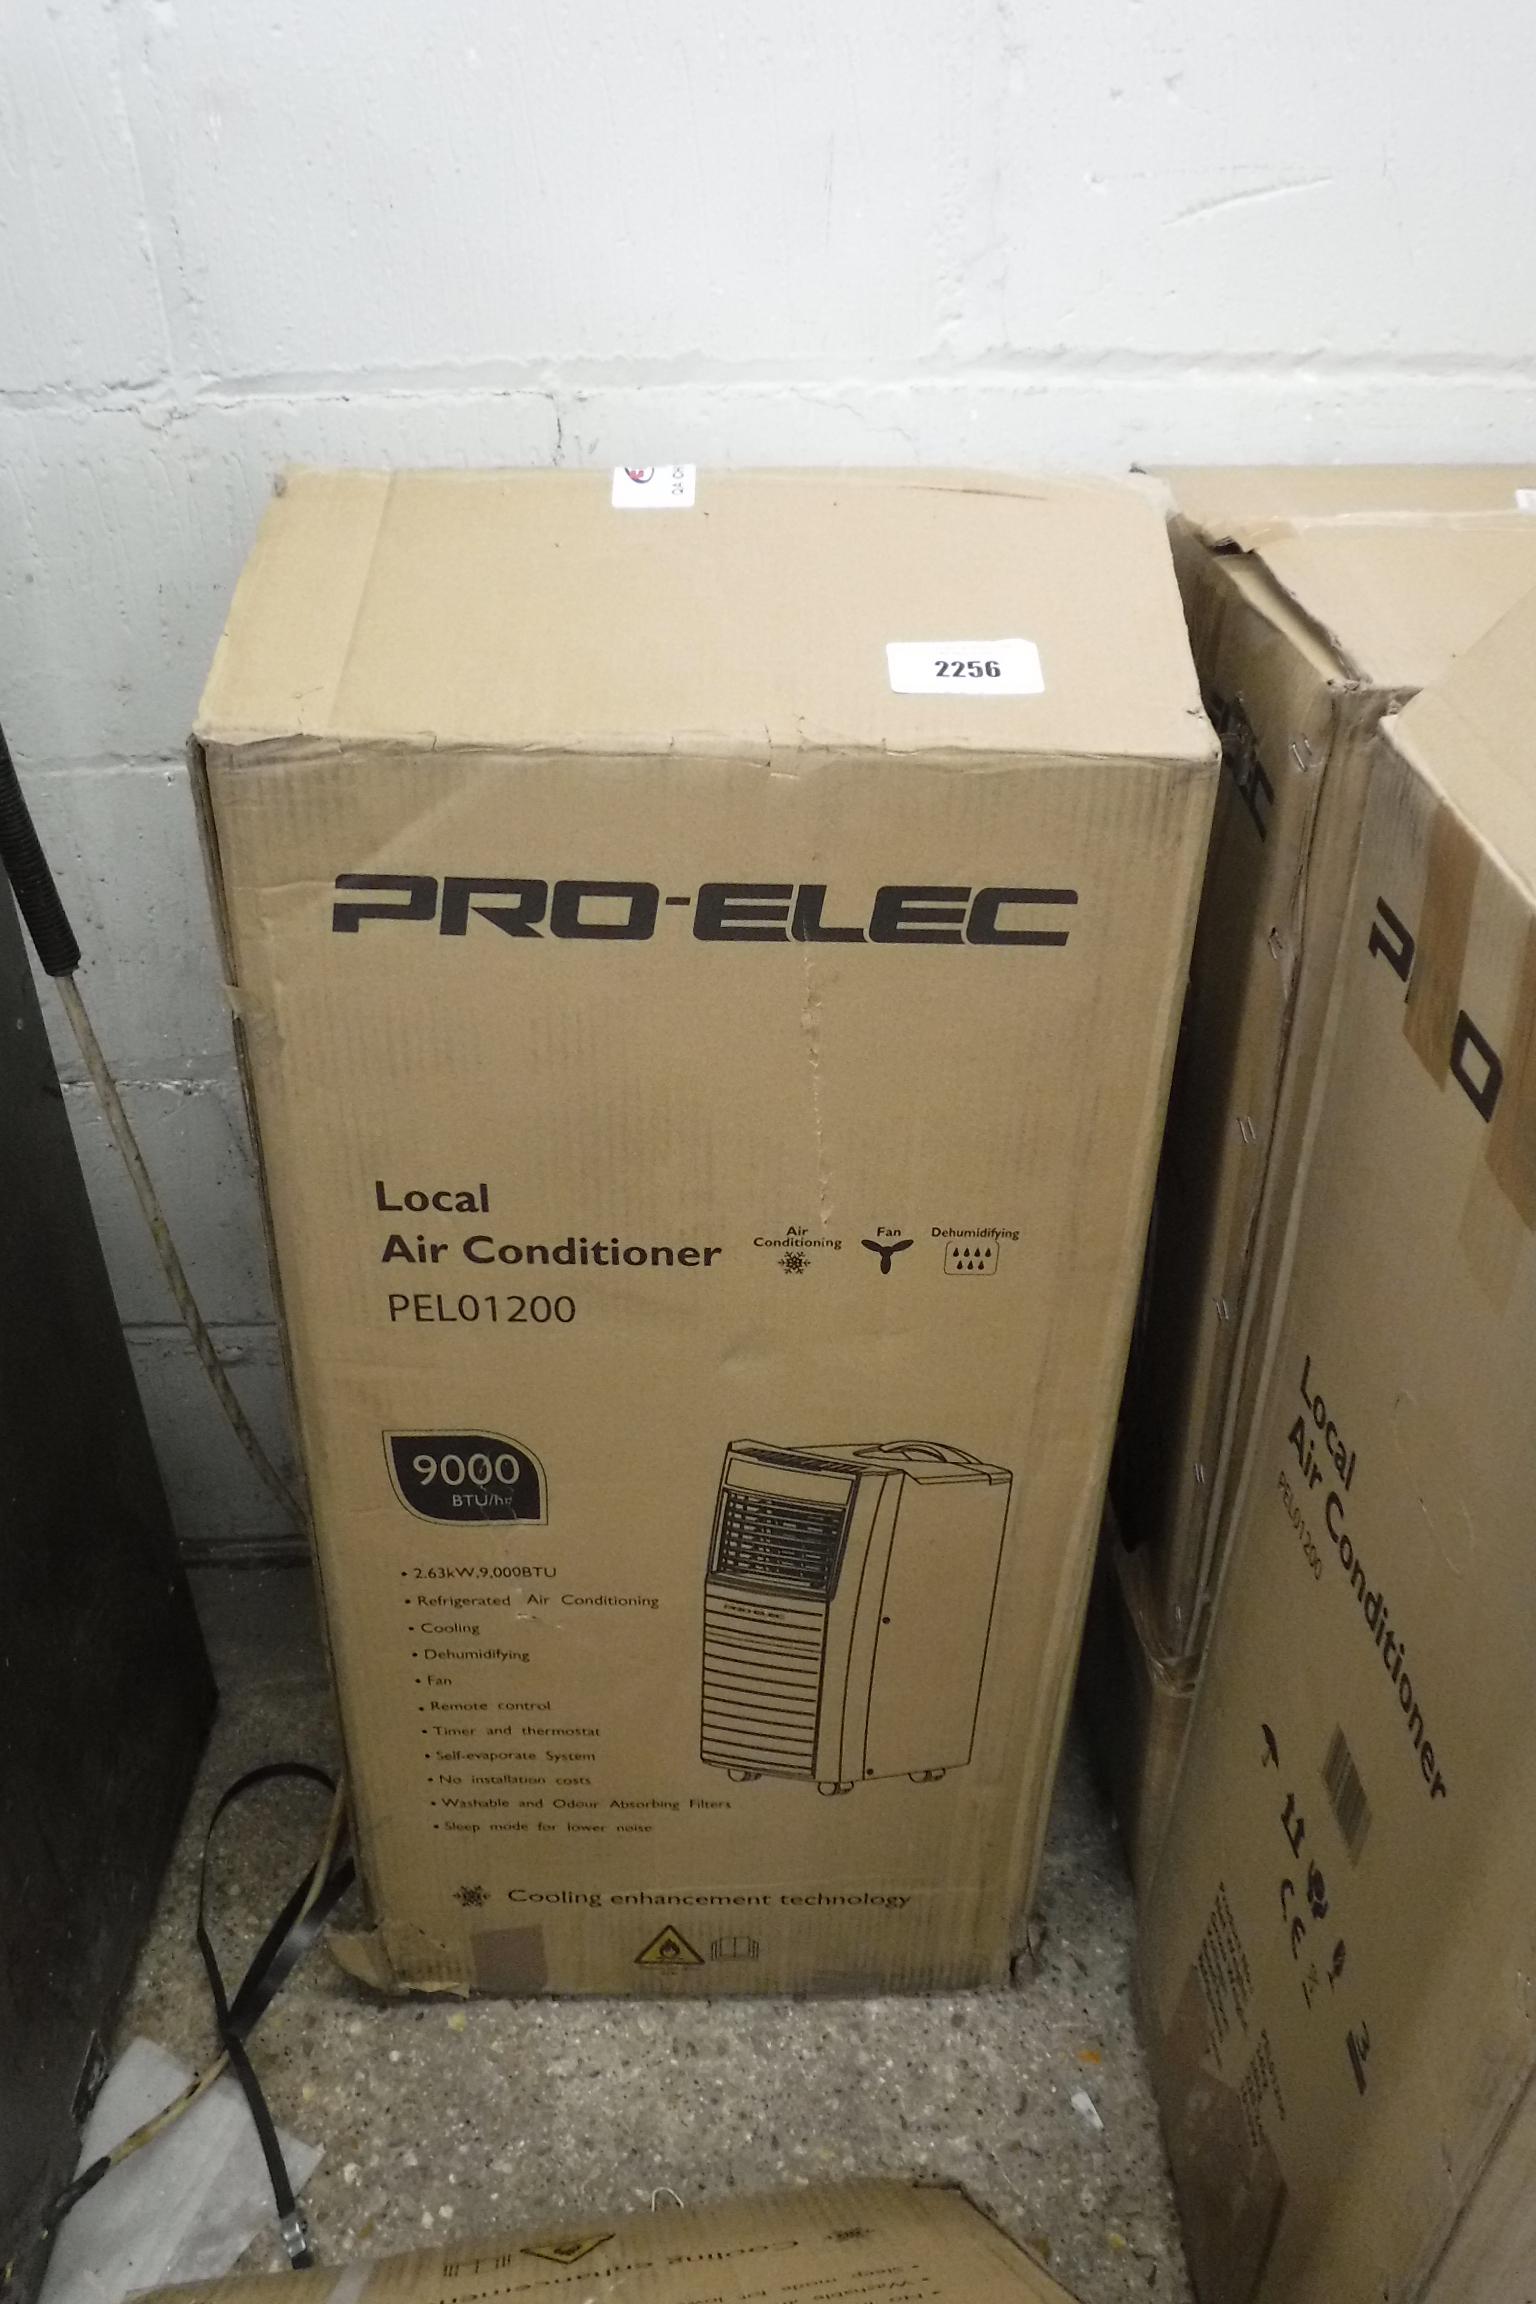 Boxed Pro Elec PEL01200 local air conditioning unit